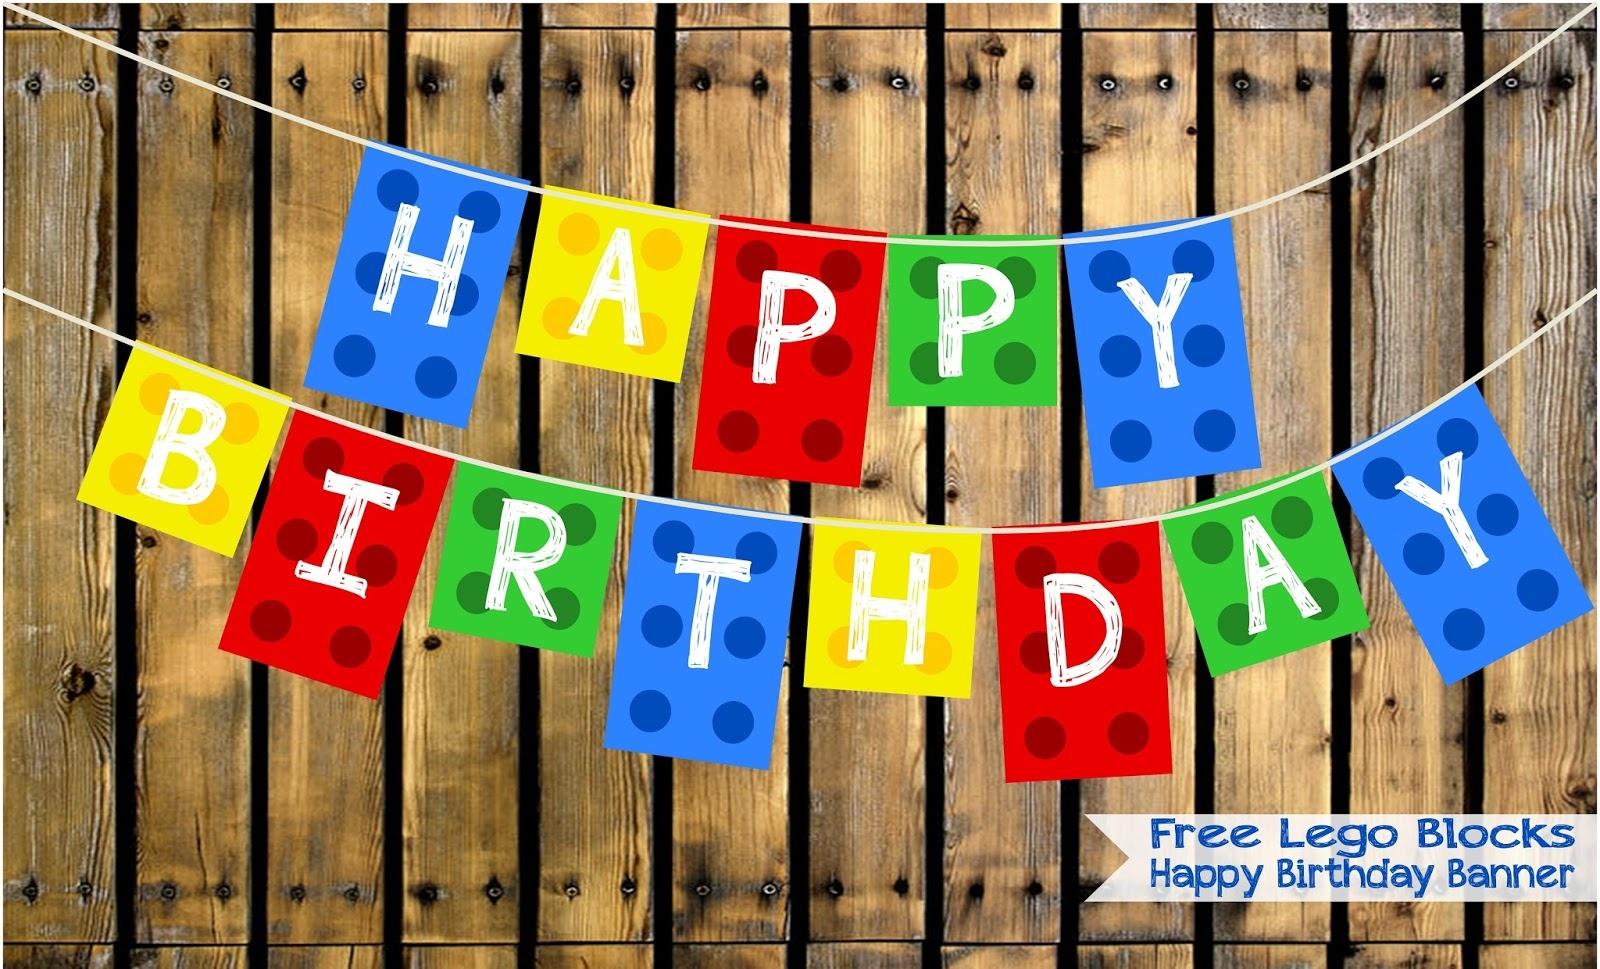 Two Magical Moms: Free Lego Blocks Happy Birthday Banner - Free Printable Lego Banner